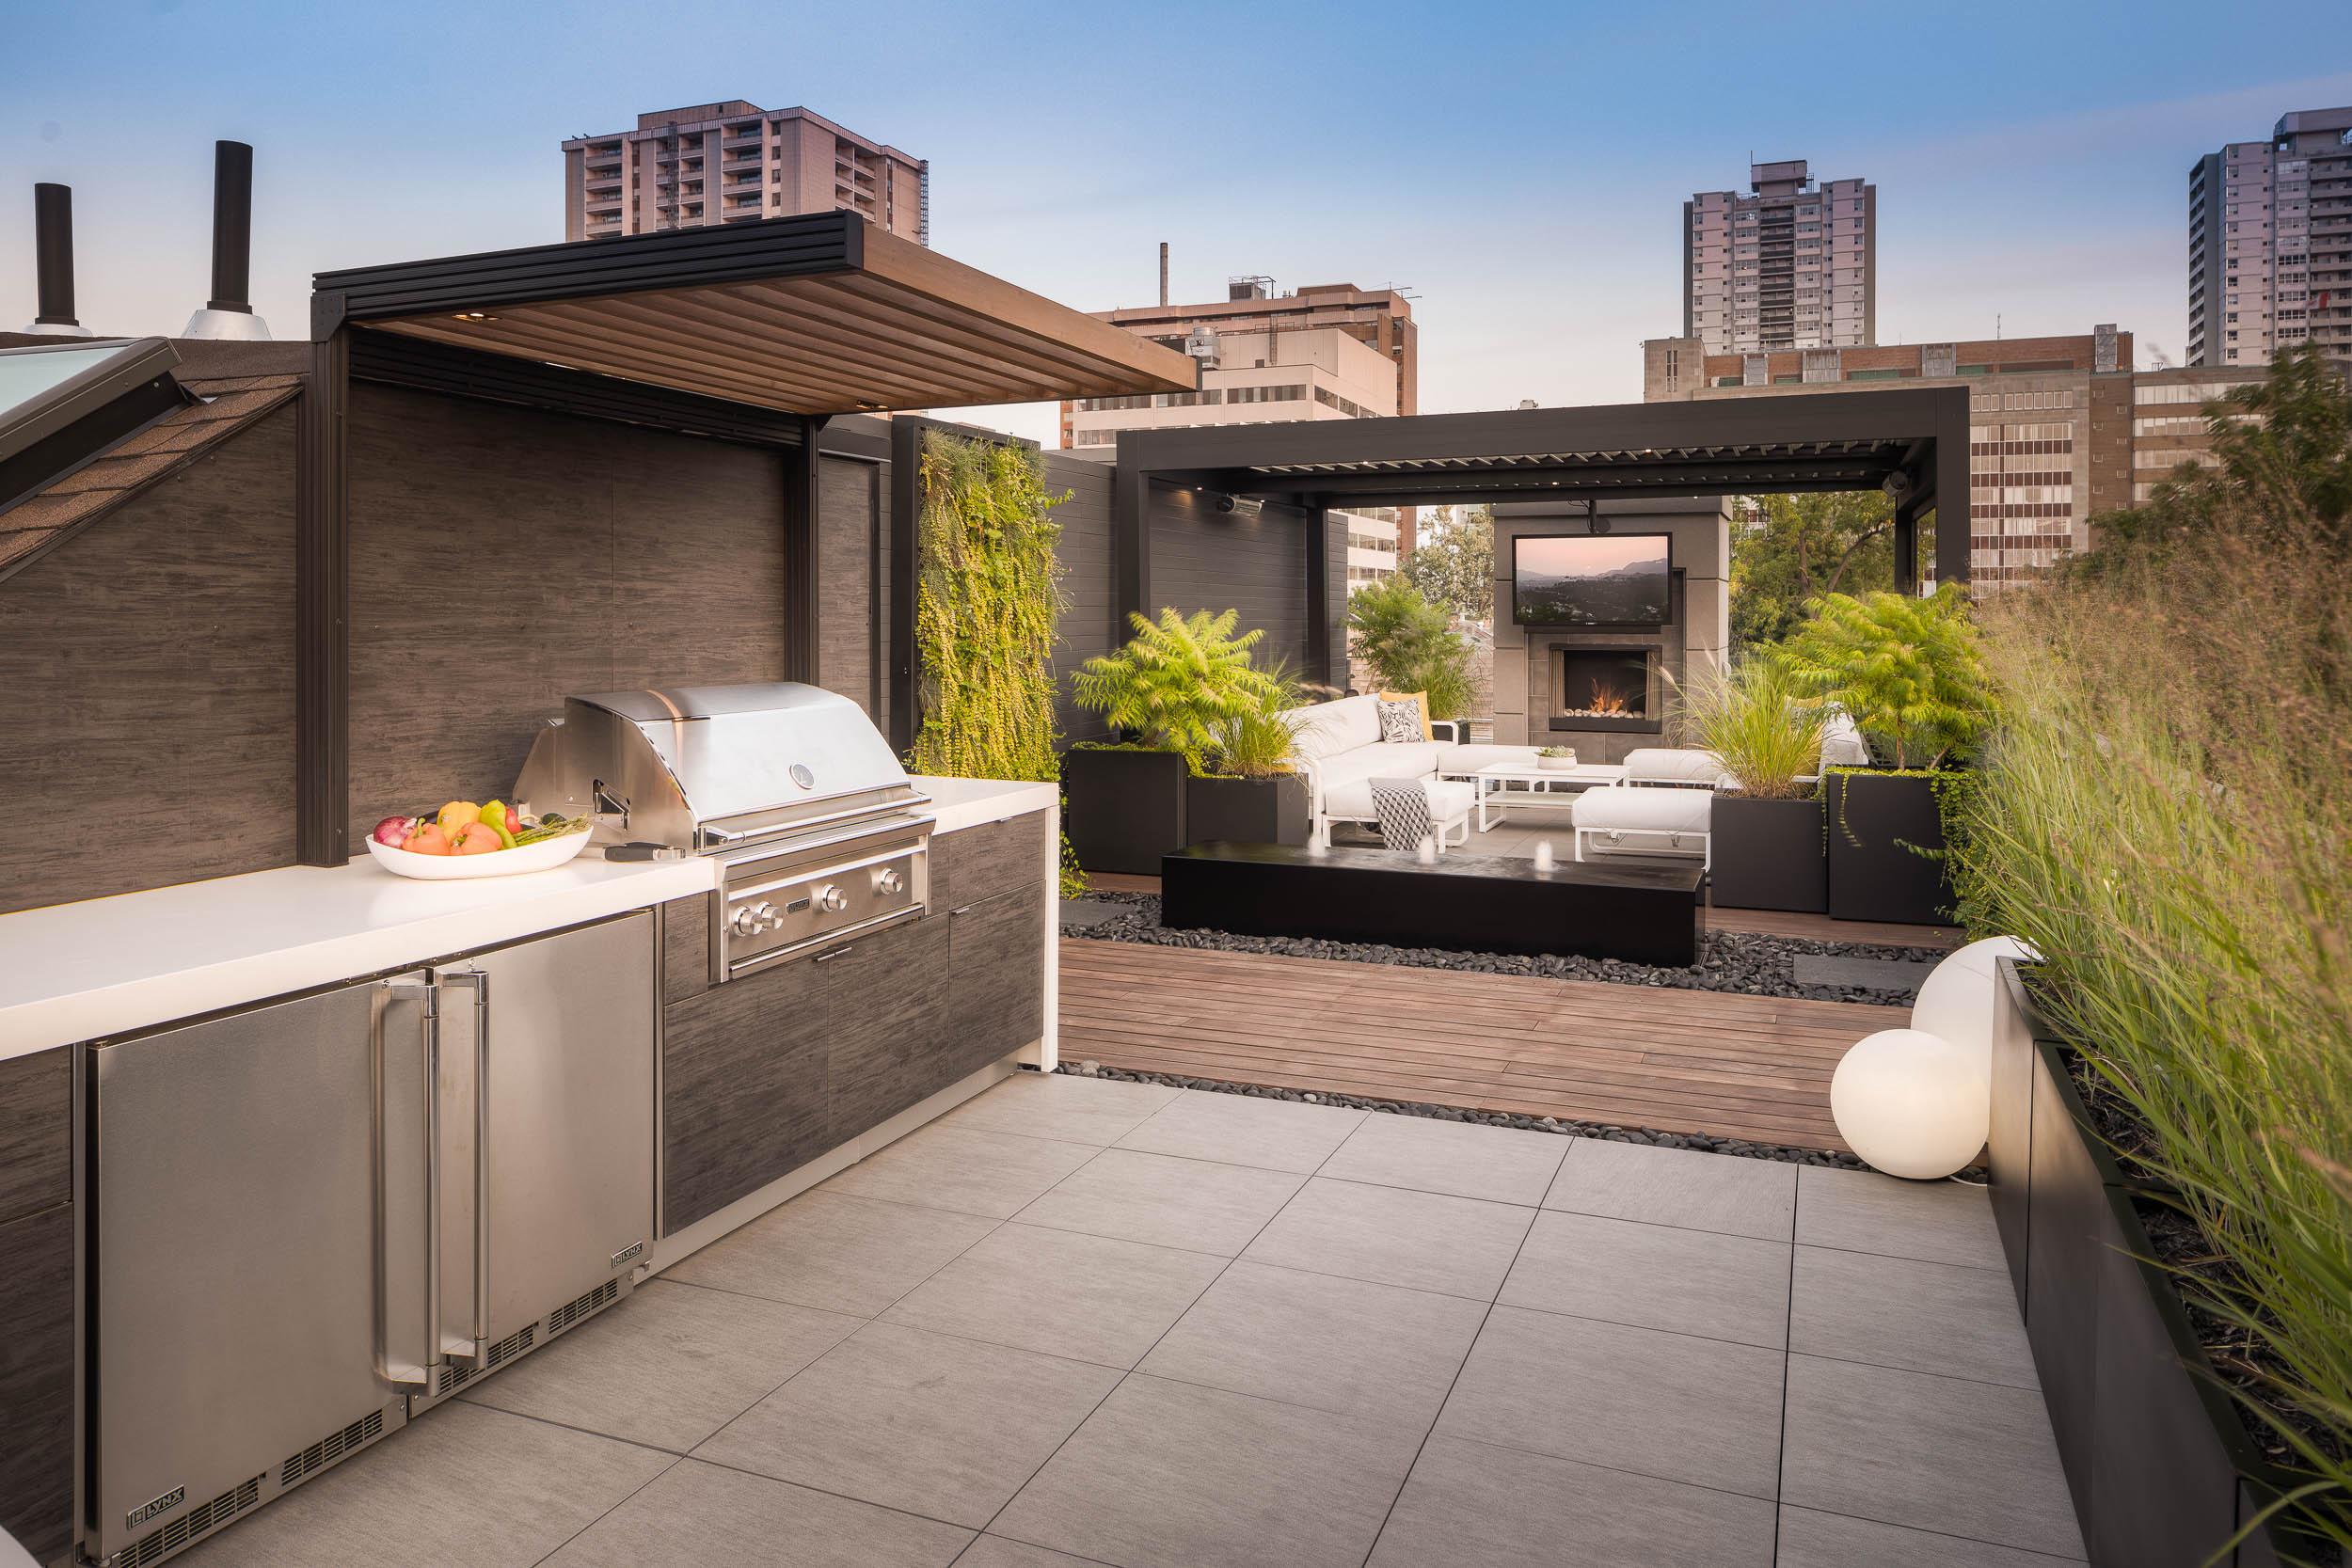 Garden Living - Rooftop Kitchen Lynx 2.jpg